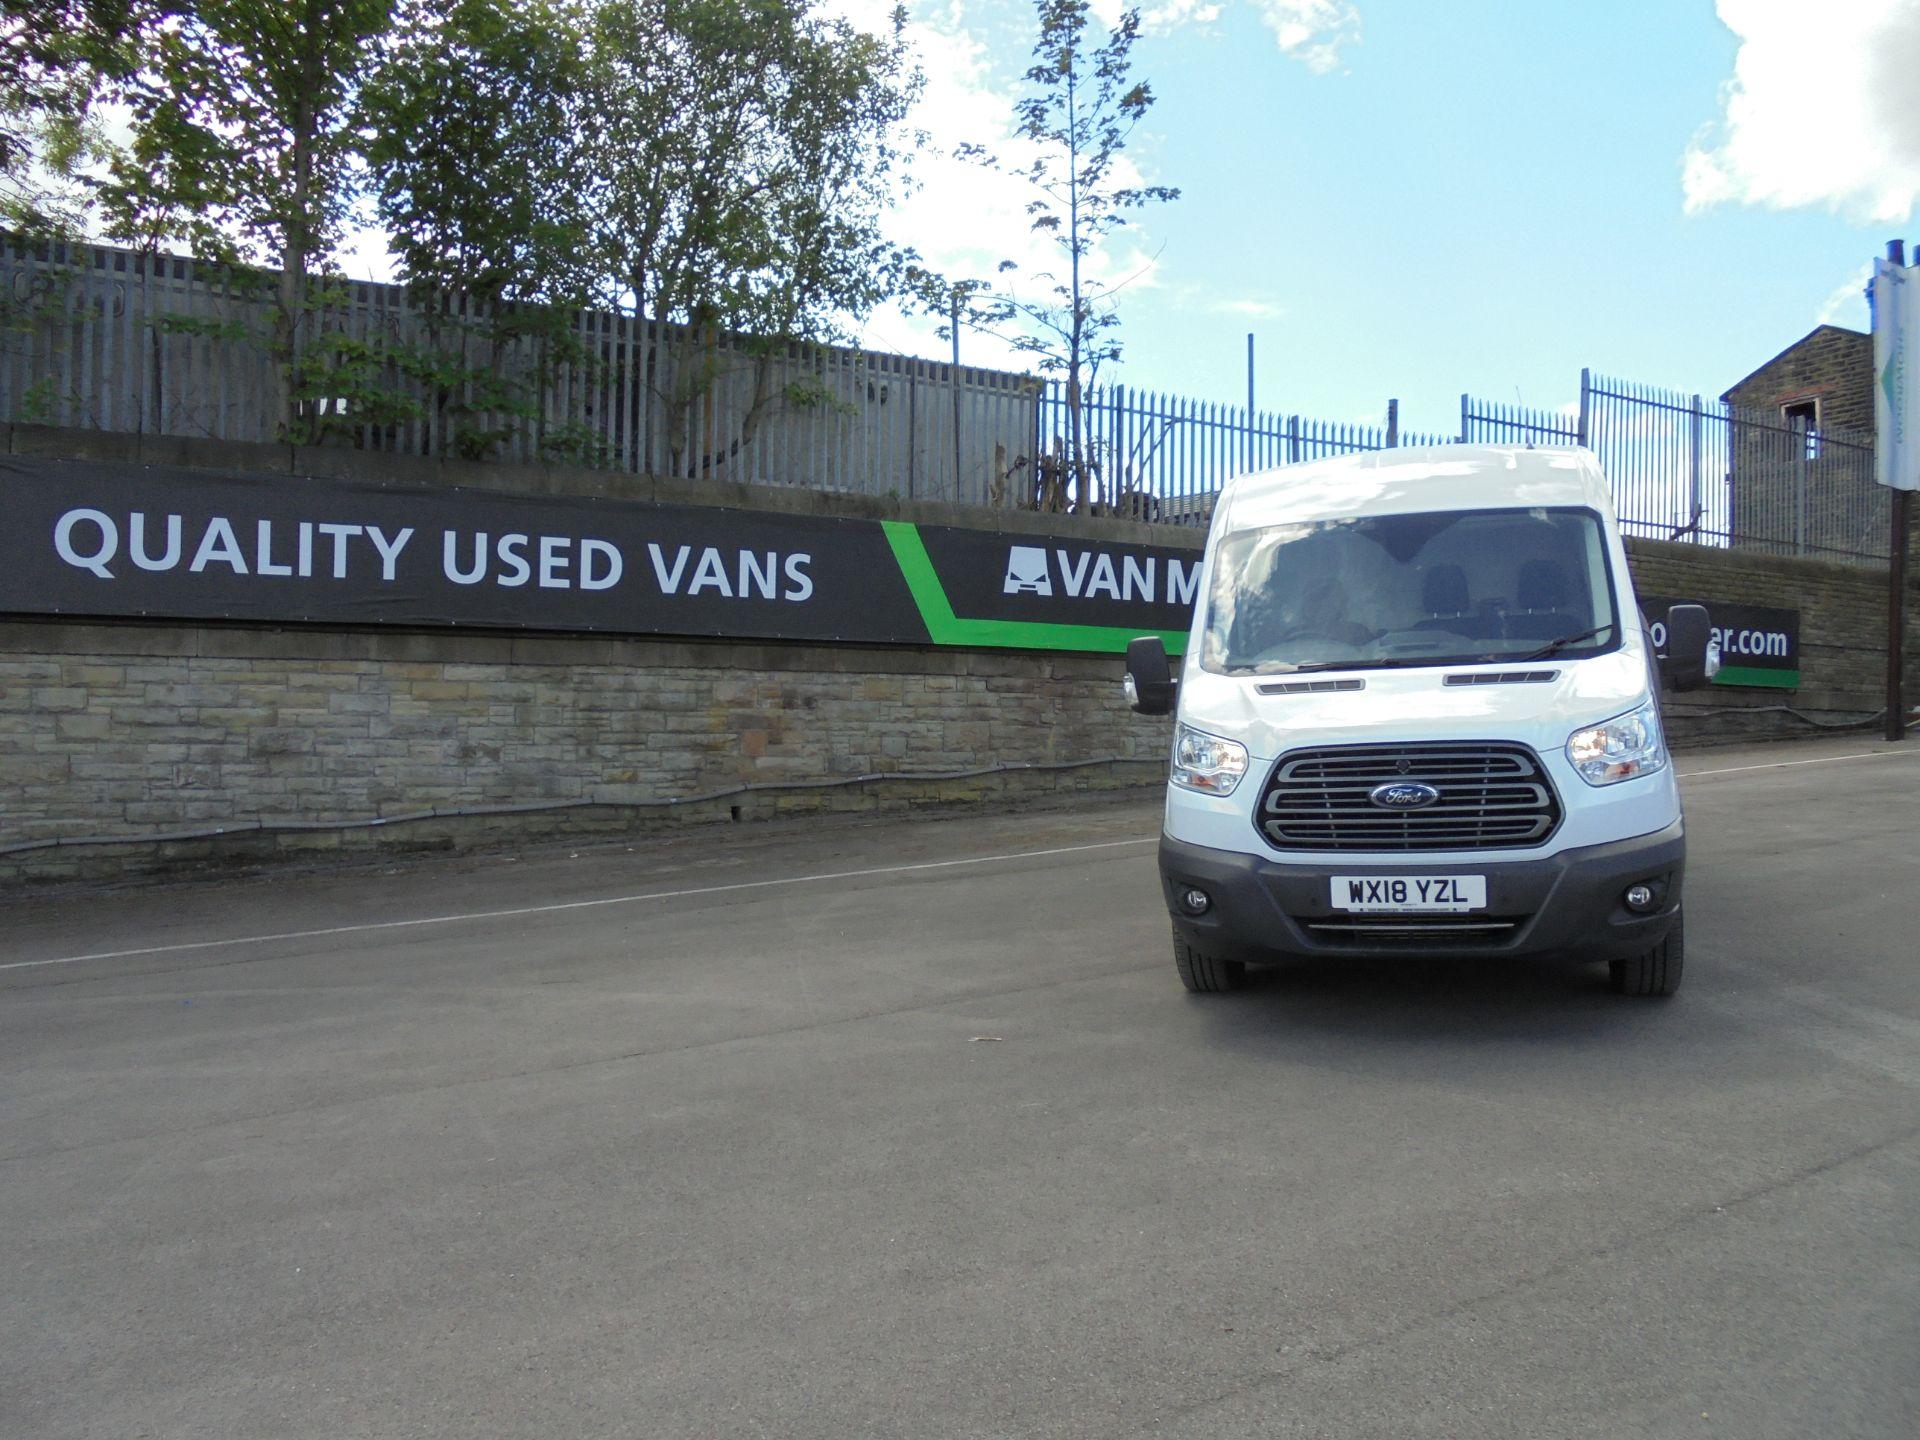 2018 Ford Transit 2.0 Tdci 130Ps H2 Van L3 trend , parking sensors (WX18YZL)